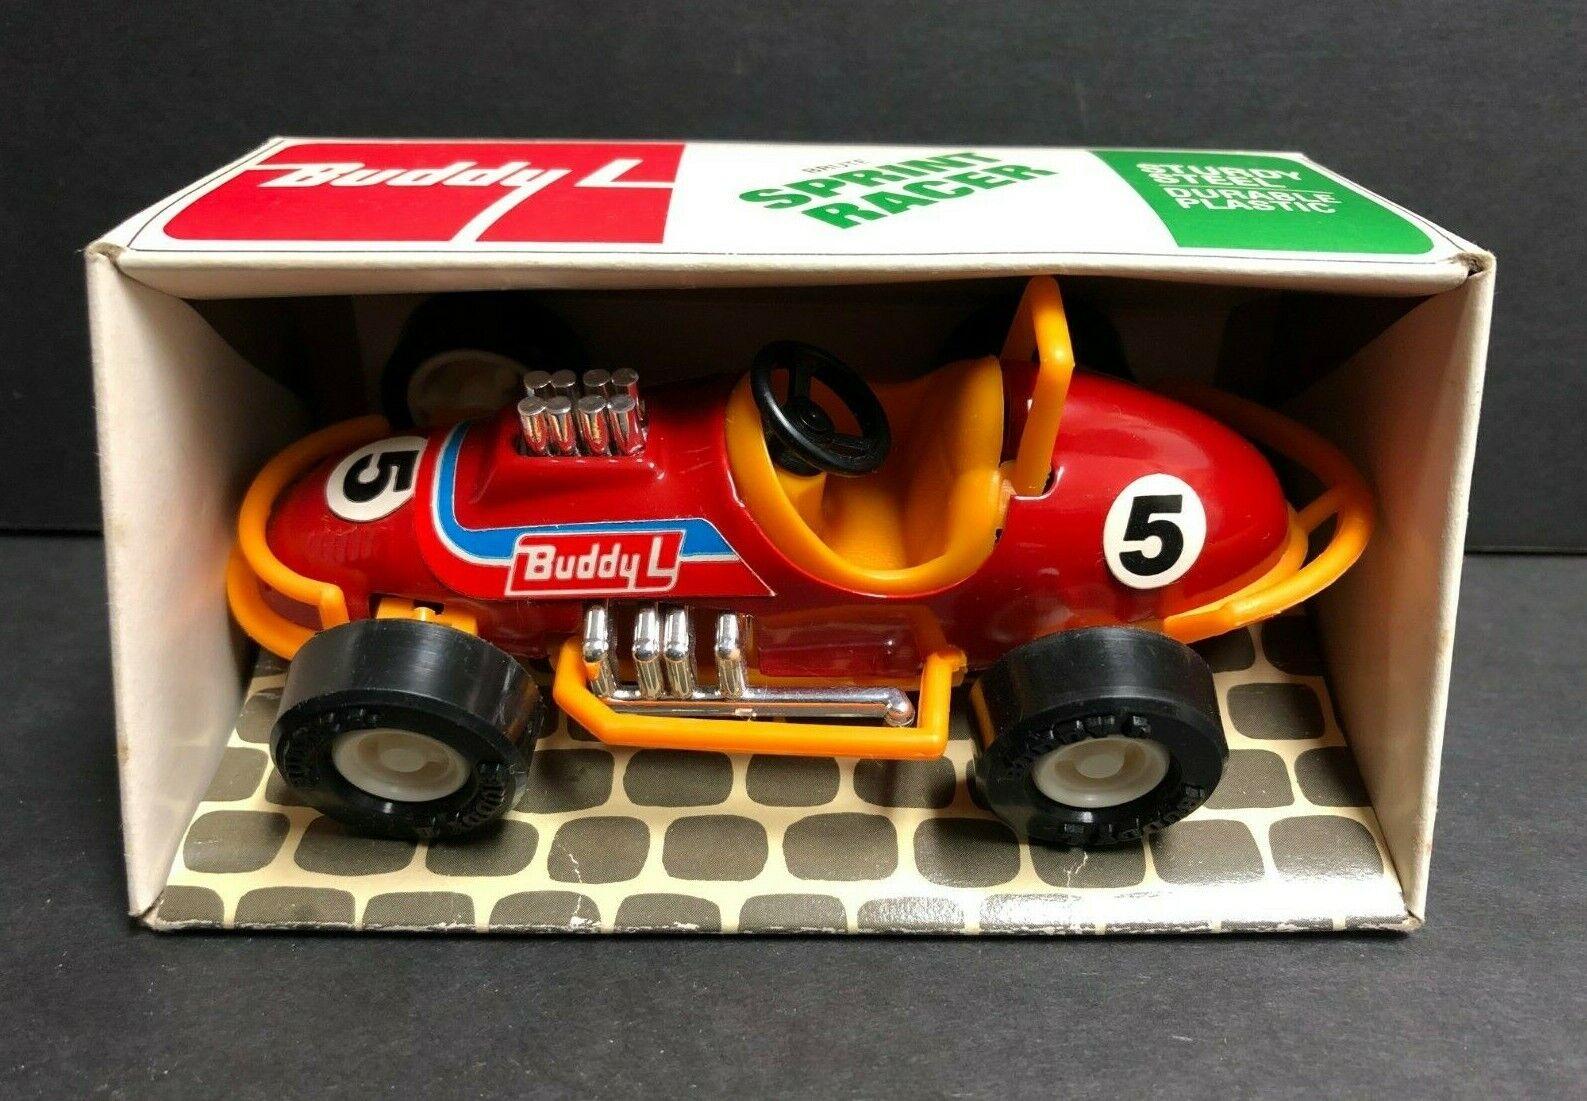 Vintage 1976 BUDDY L Brute SPRINT RACER 4924D 4924D 4924D  NOS  NEW in original box  160885